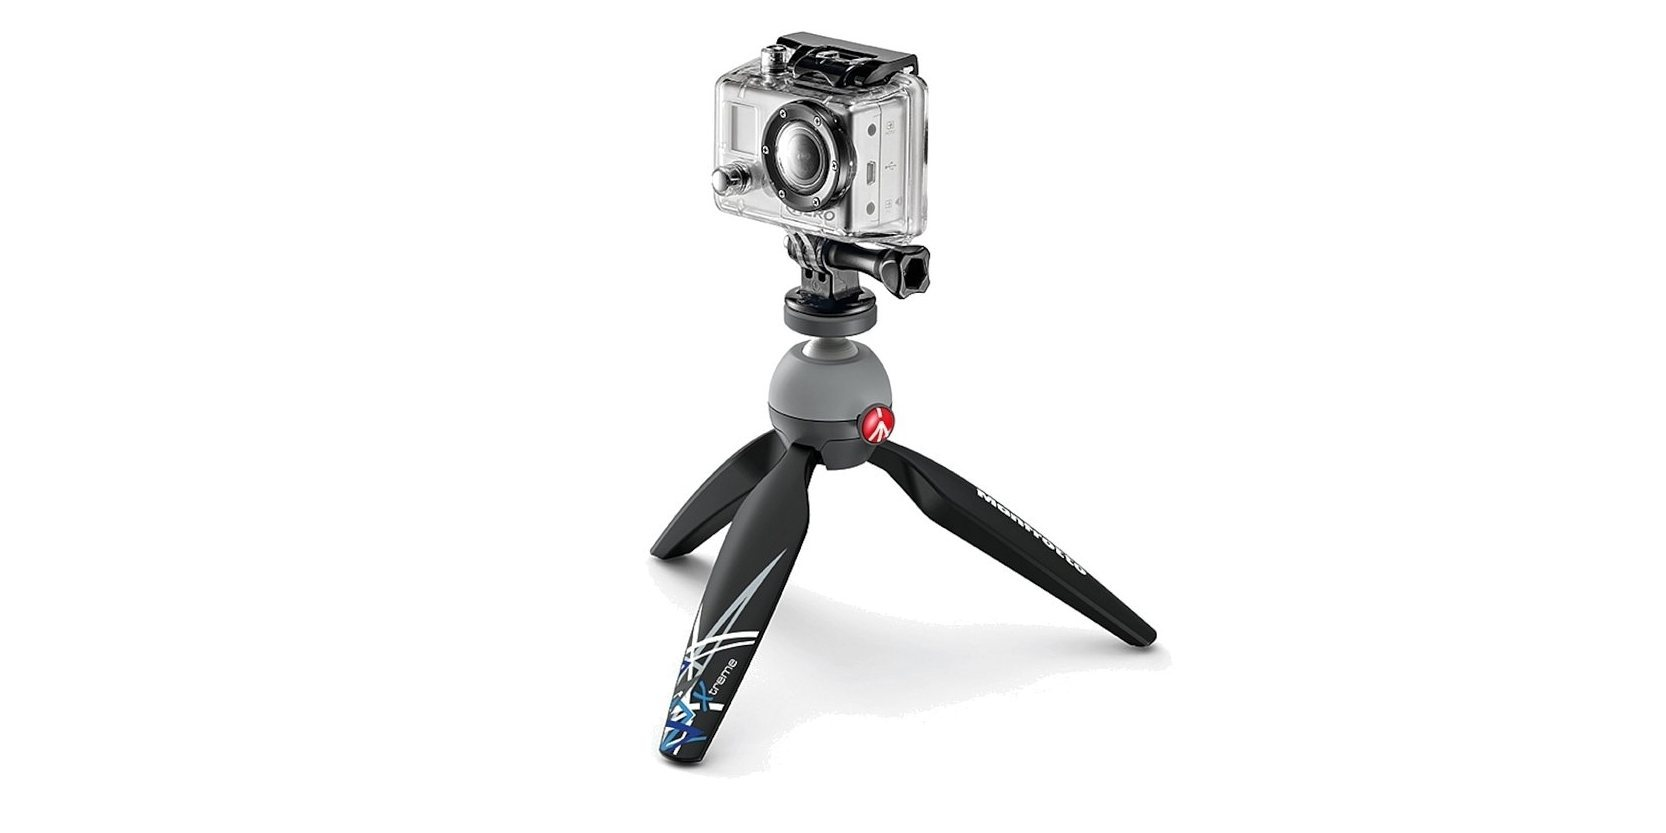 Штатив Manfrotto для экшн-камер с камерой